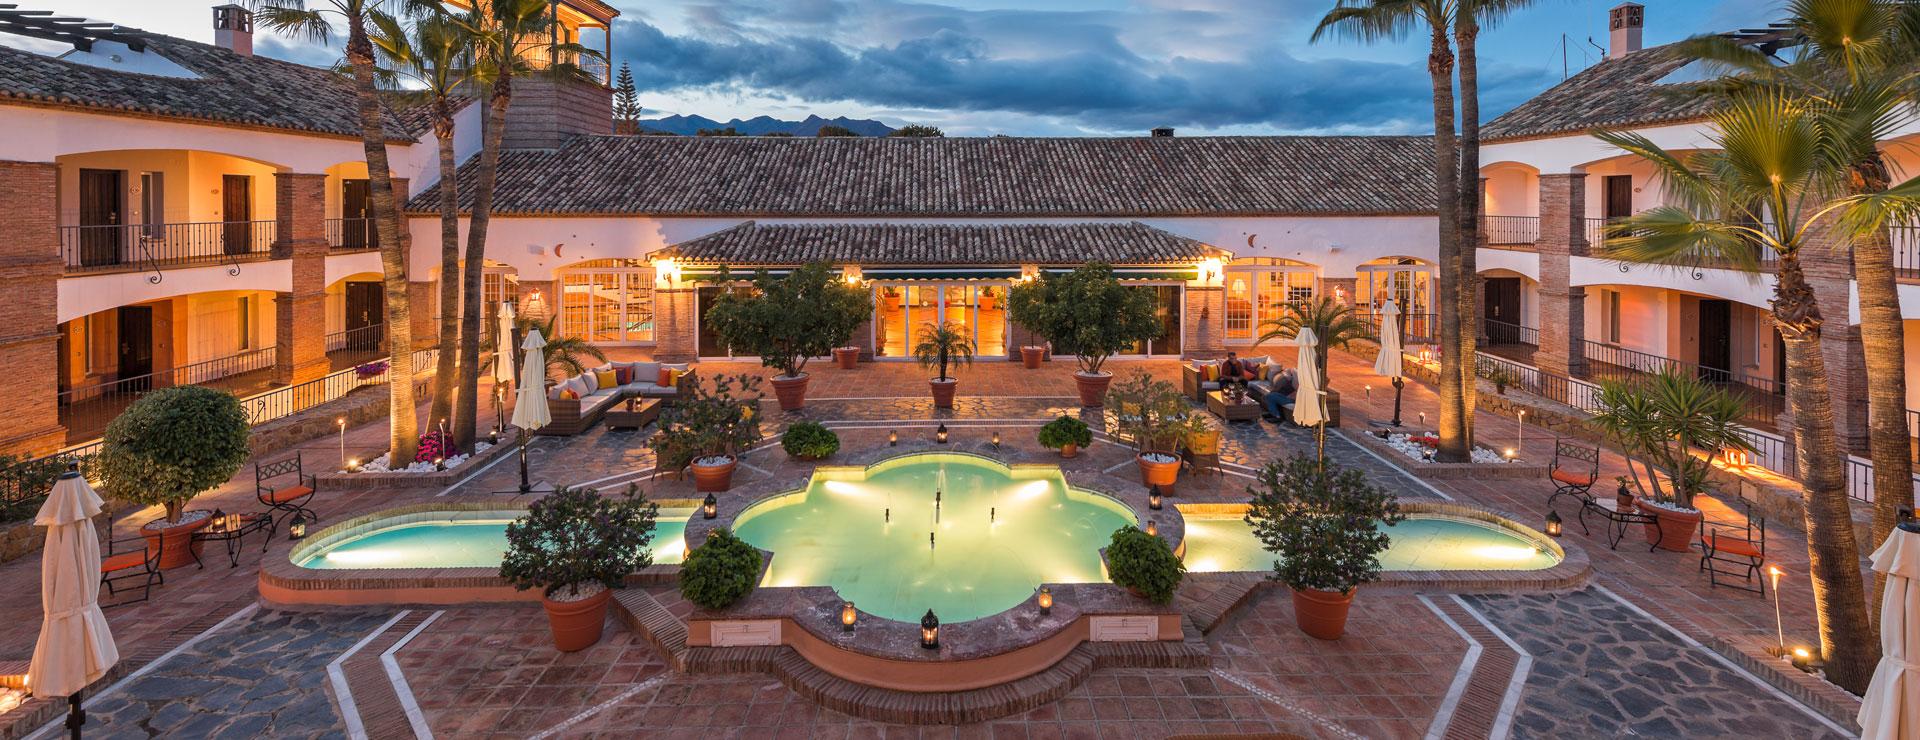 Patio Naranjo - La Cala Hotel